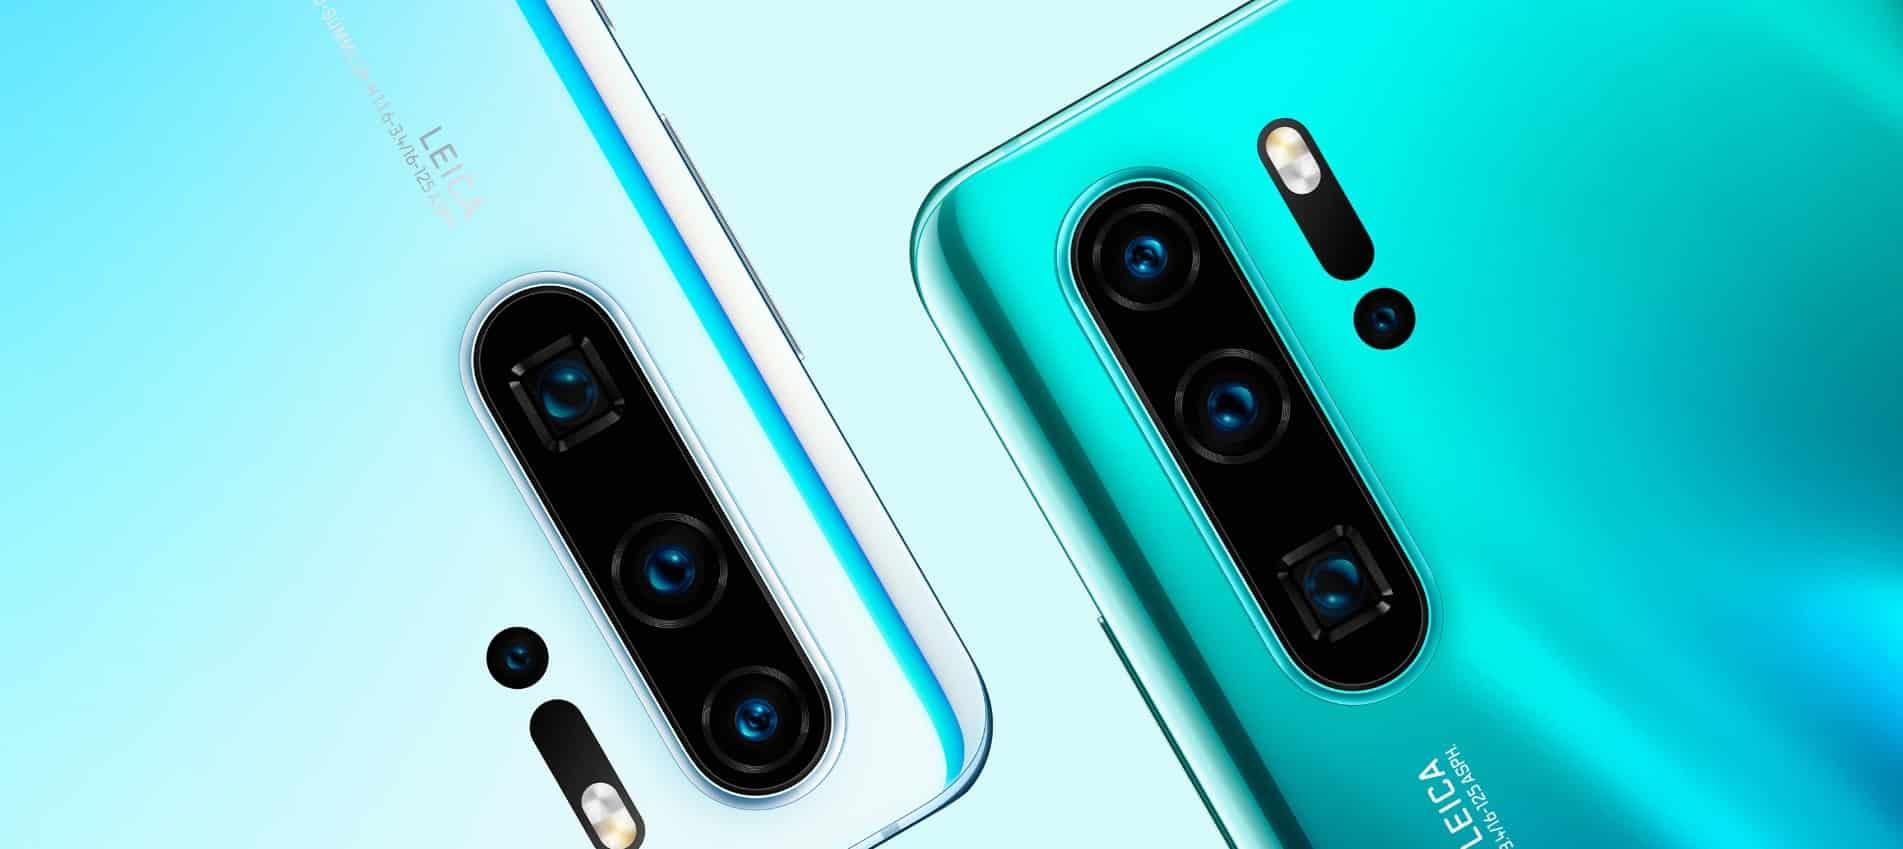 Huawei Mate 30 Reveal Date Confirmed